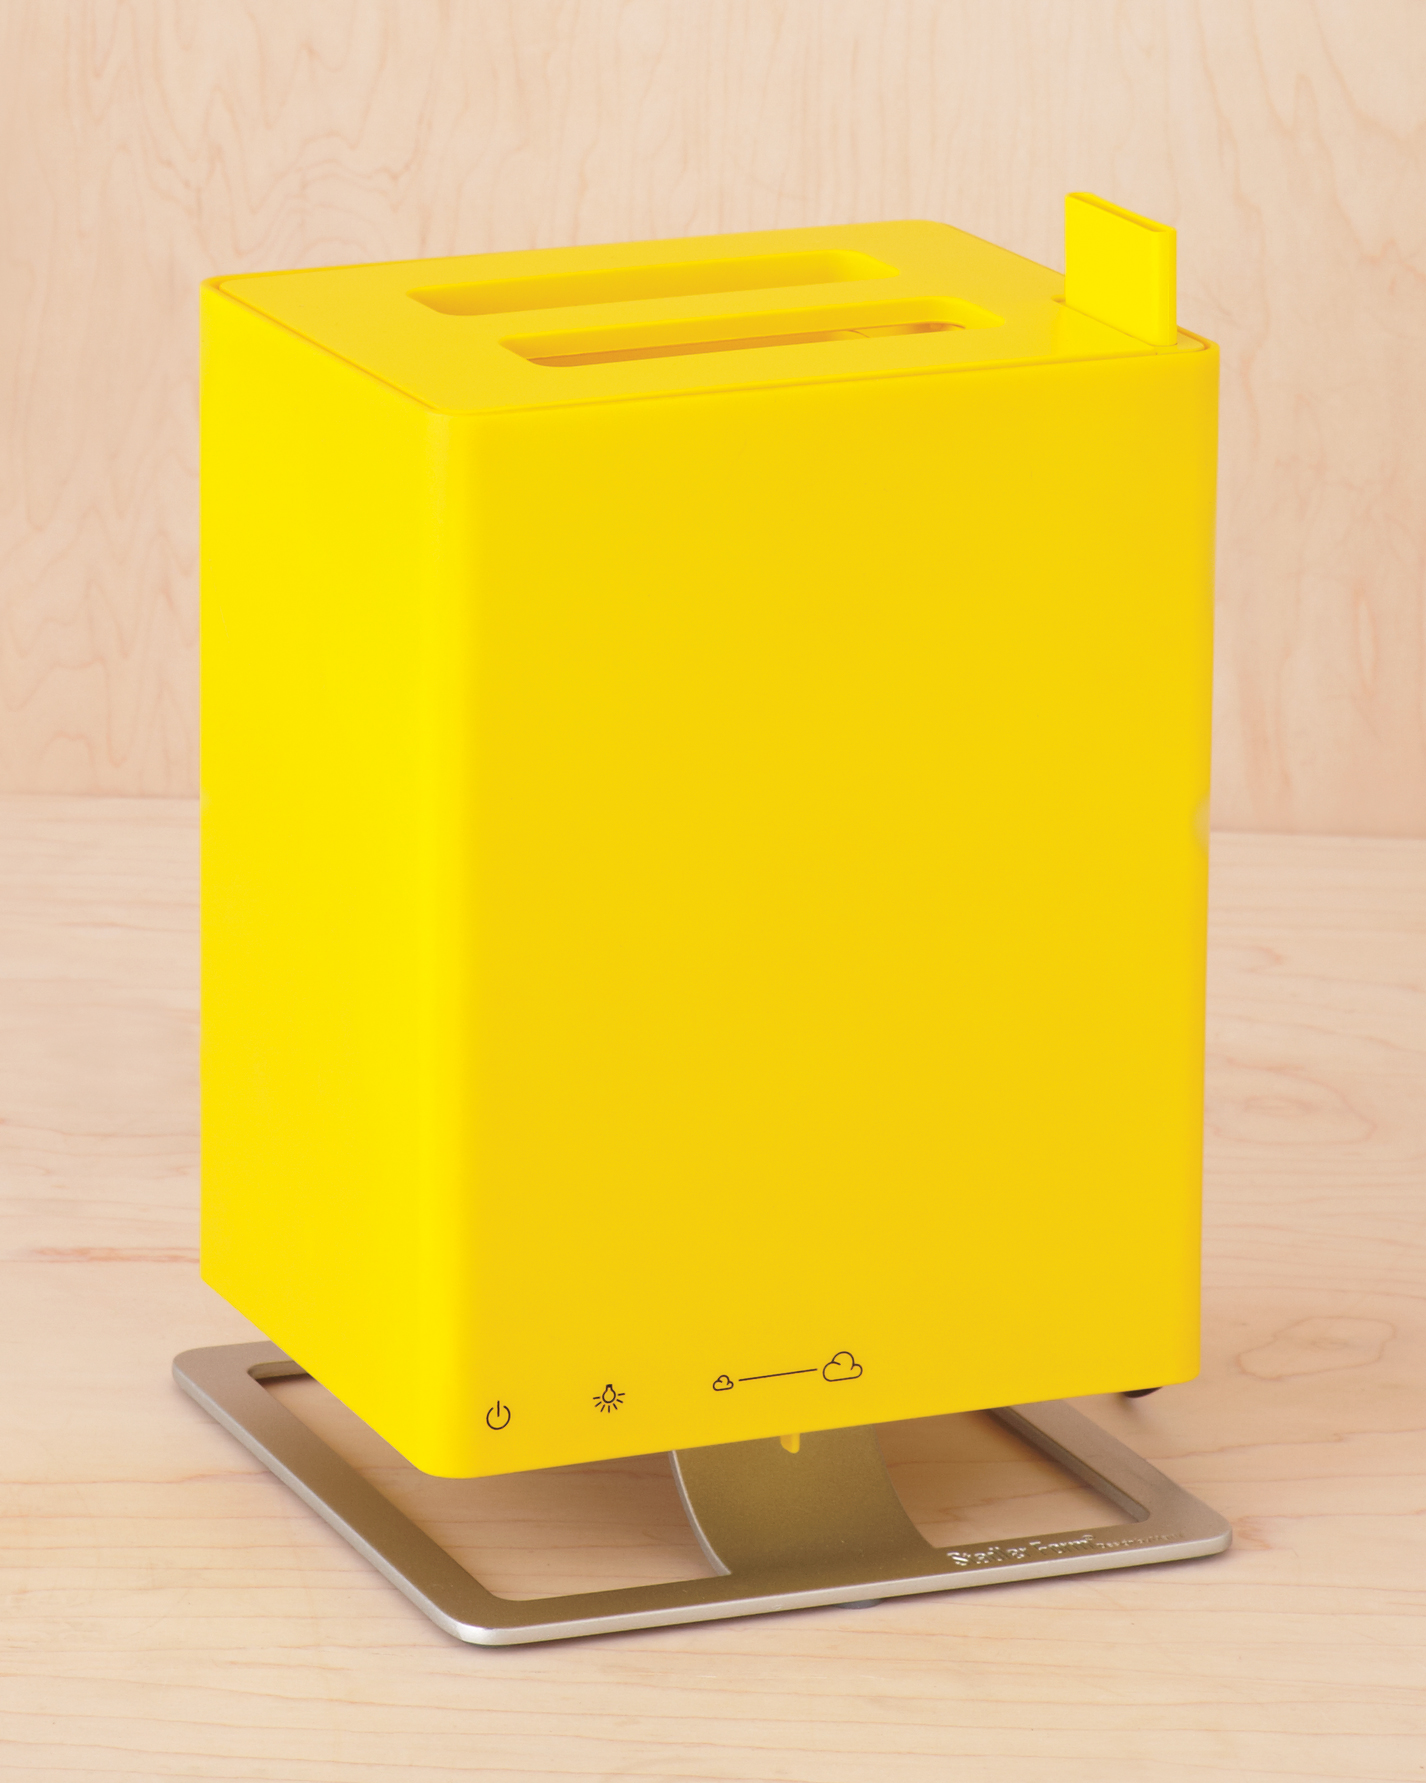 humidifier-003-mwd109796.jpg